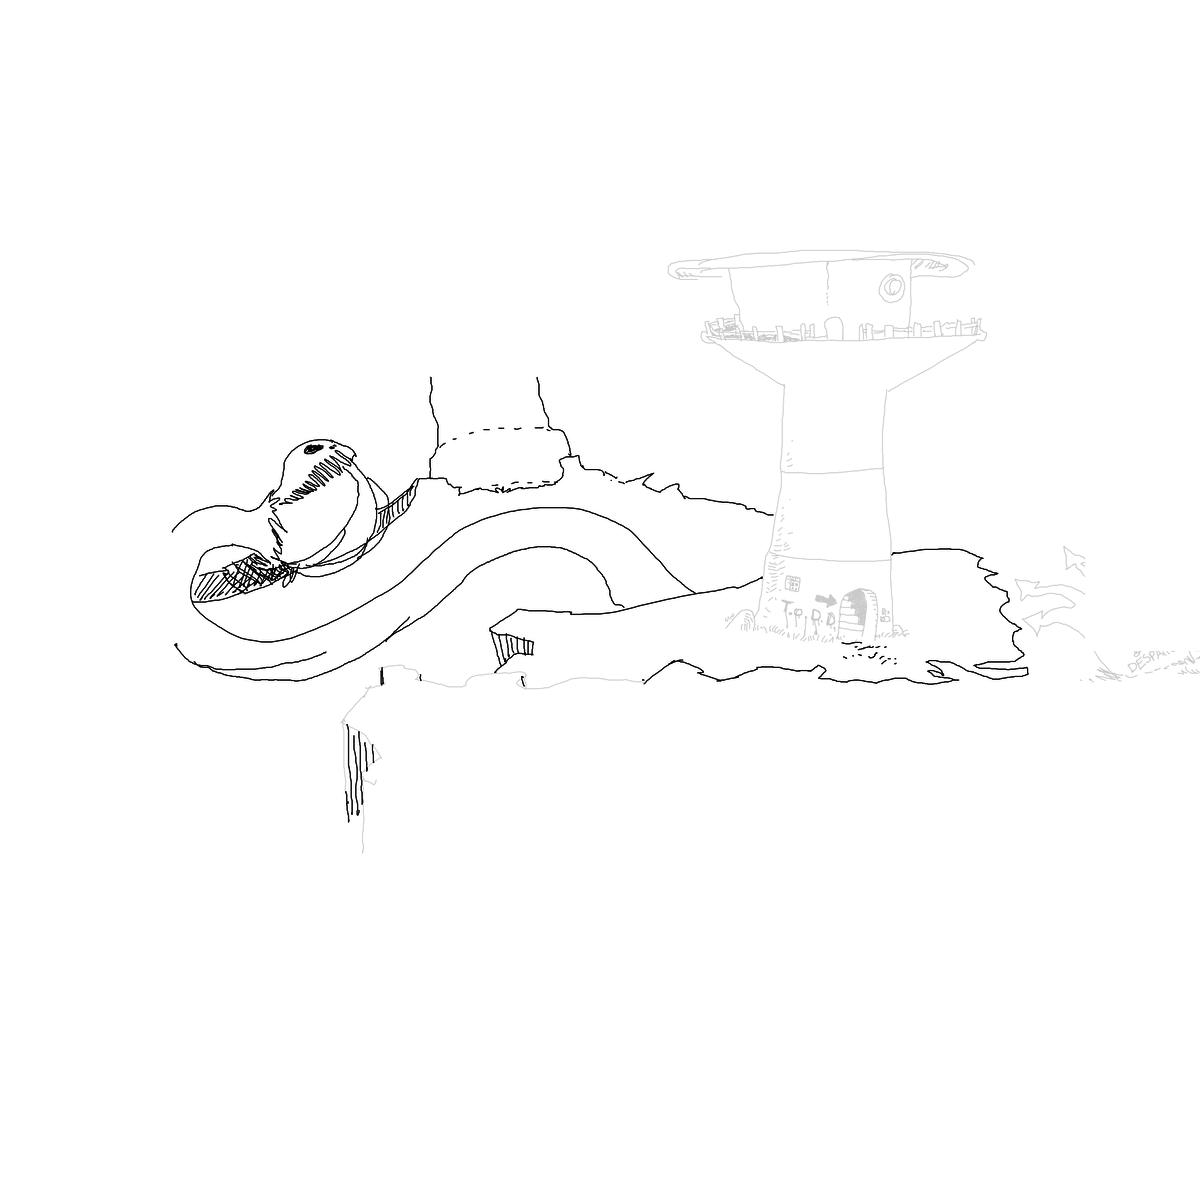 BAAAM drawing#22141 lat:78.4192276000976600lng: -4.4740767478942870